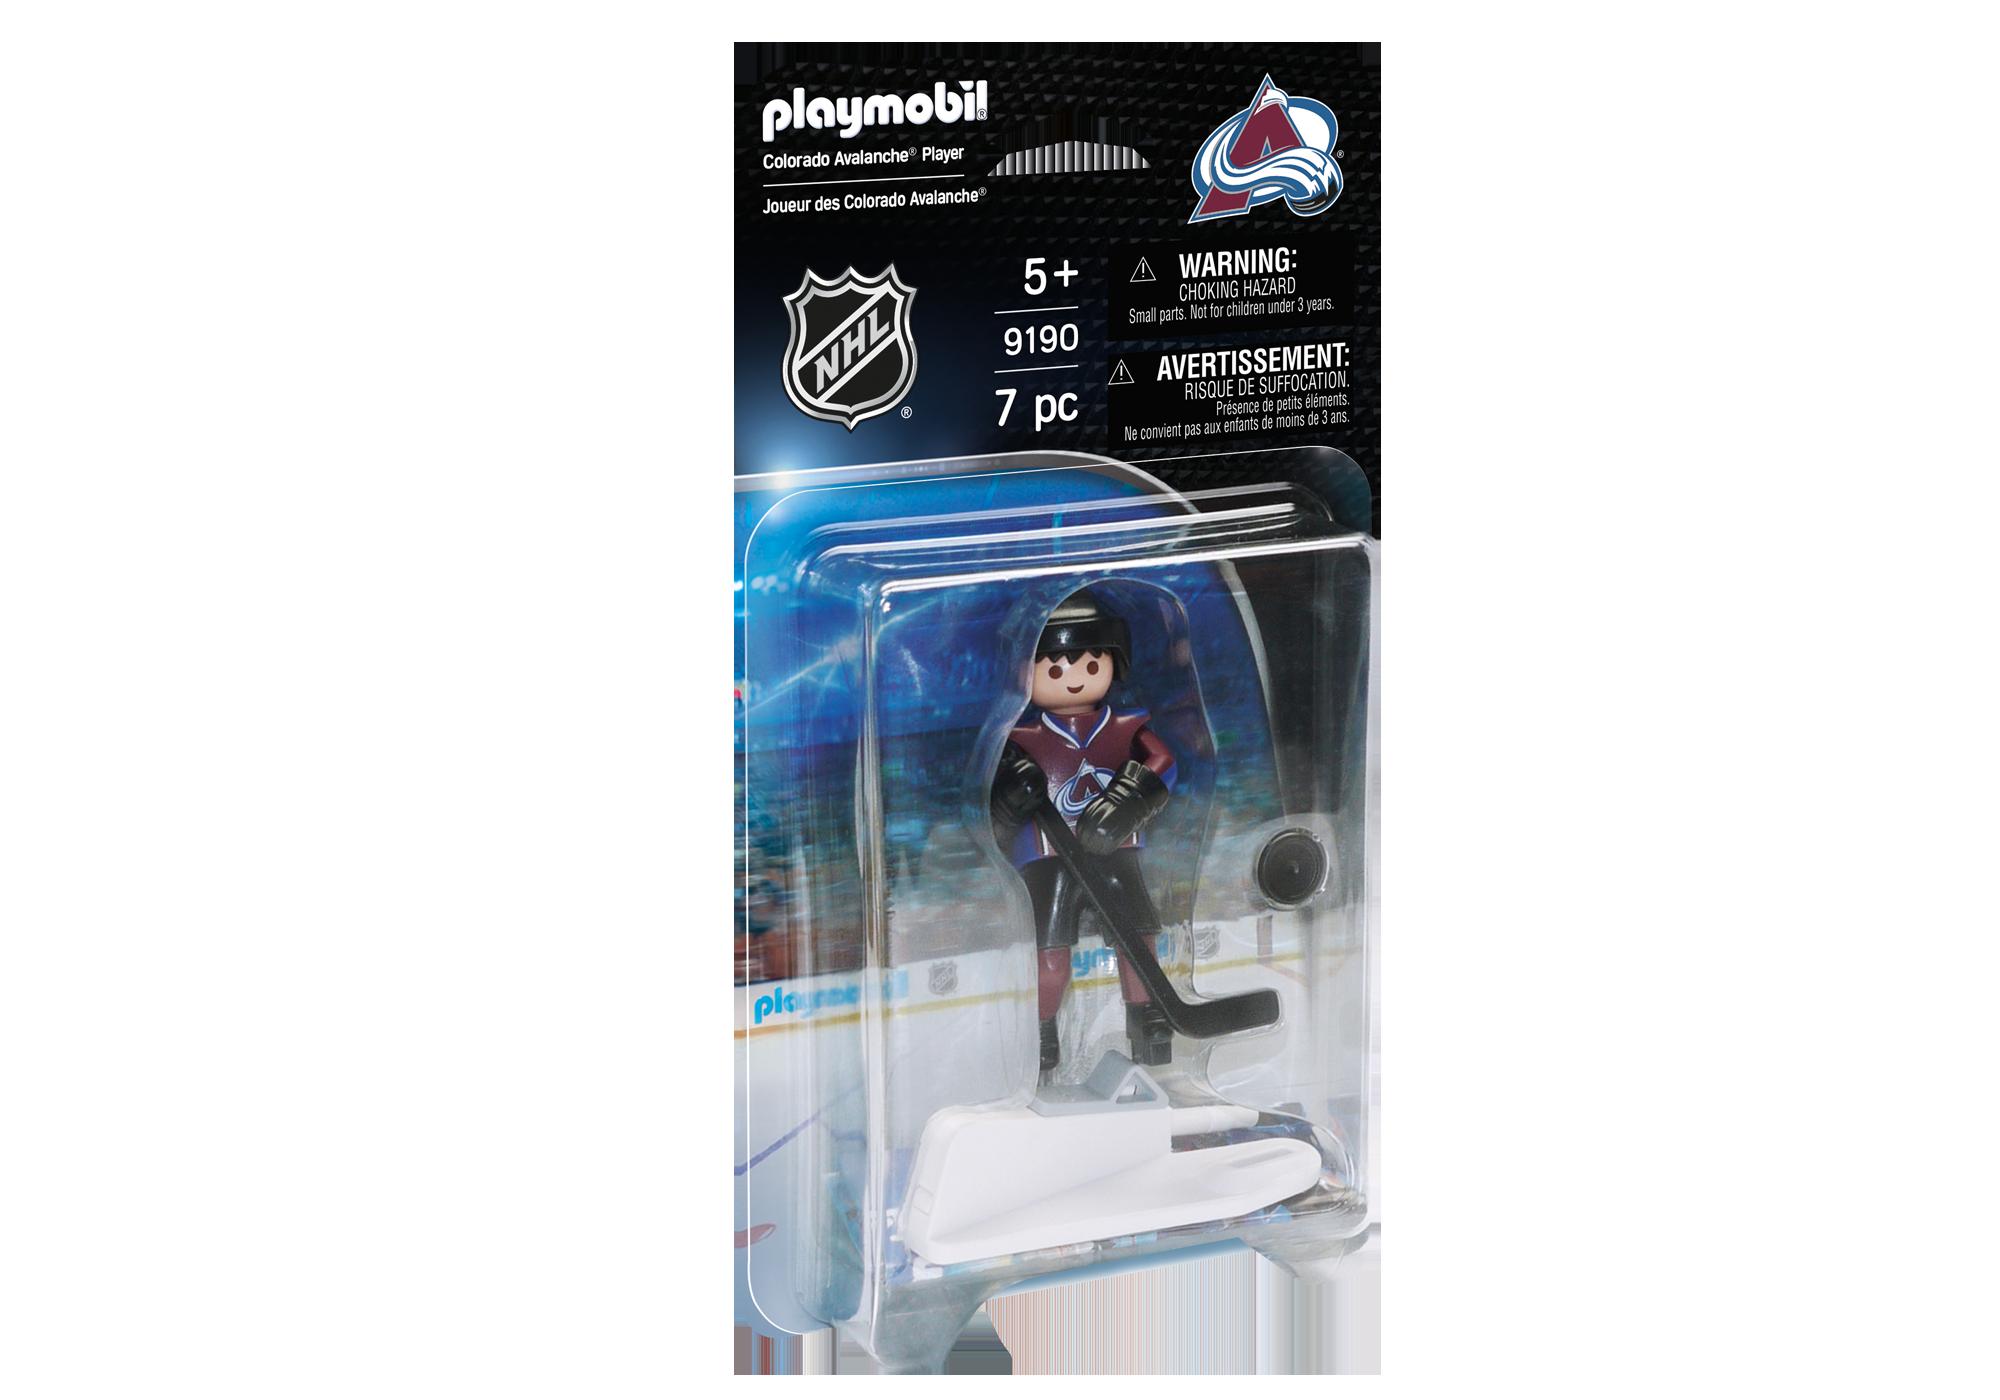 http://media.playmobil.com/i/playmobil/9190_product_box_front/NHL™ Colorado Avanlanche™ Player